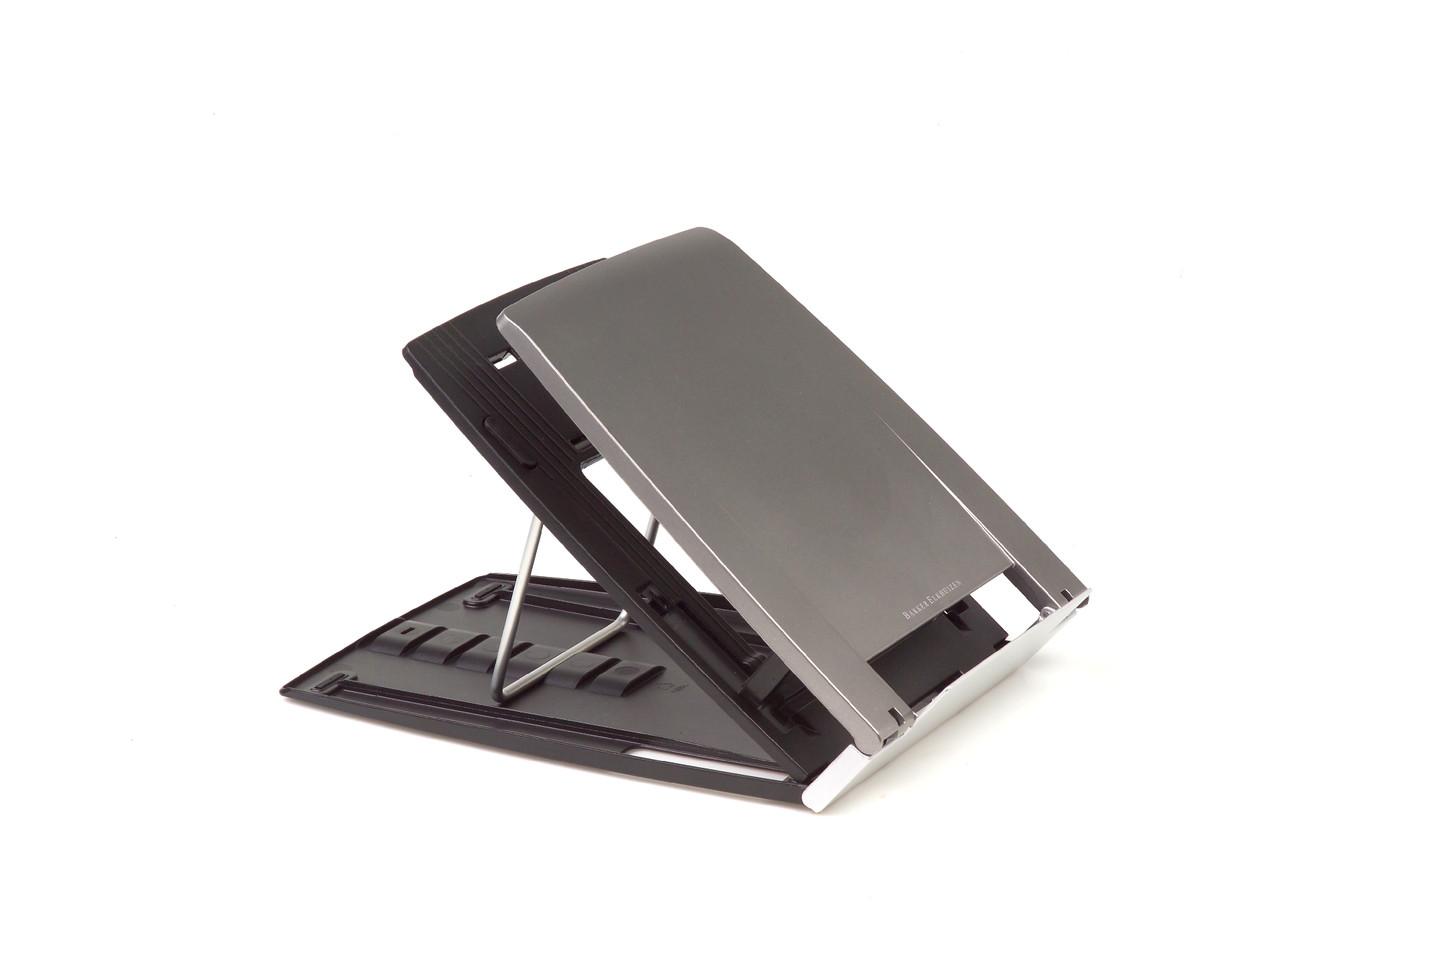 ergo-q-330-notebook-stand-1395147979.jpg